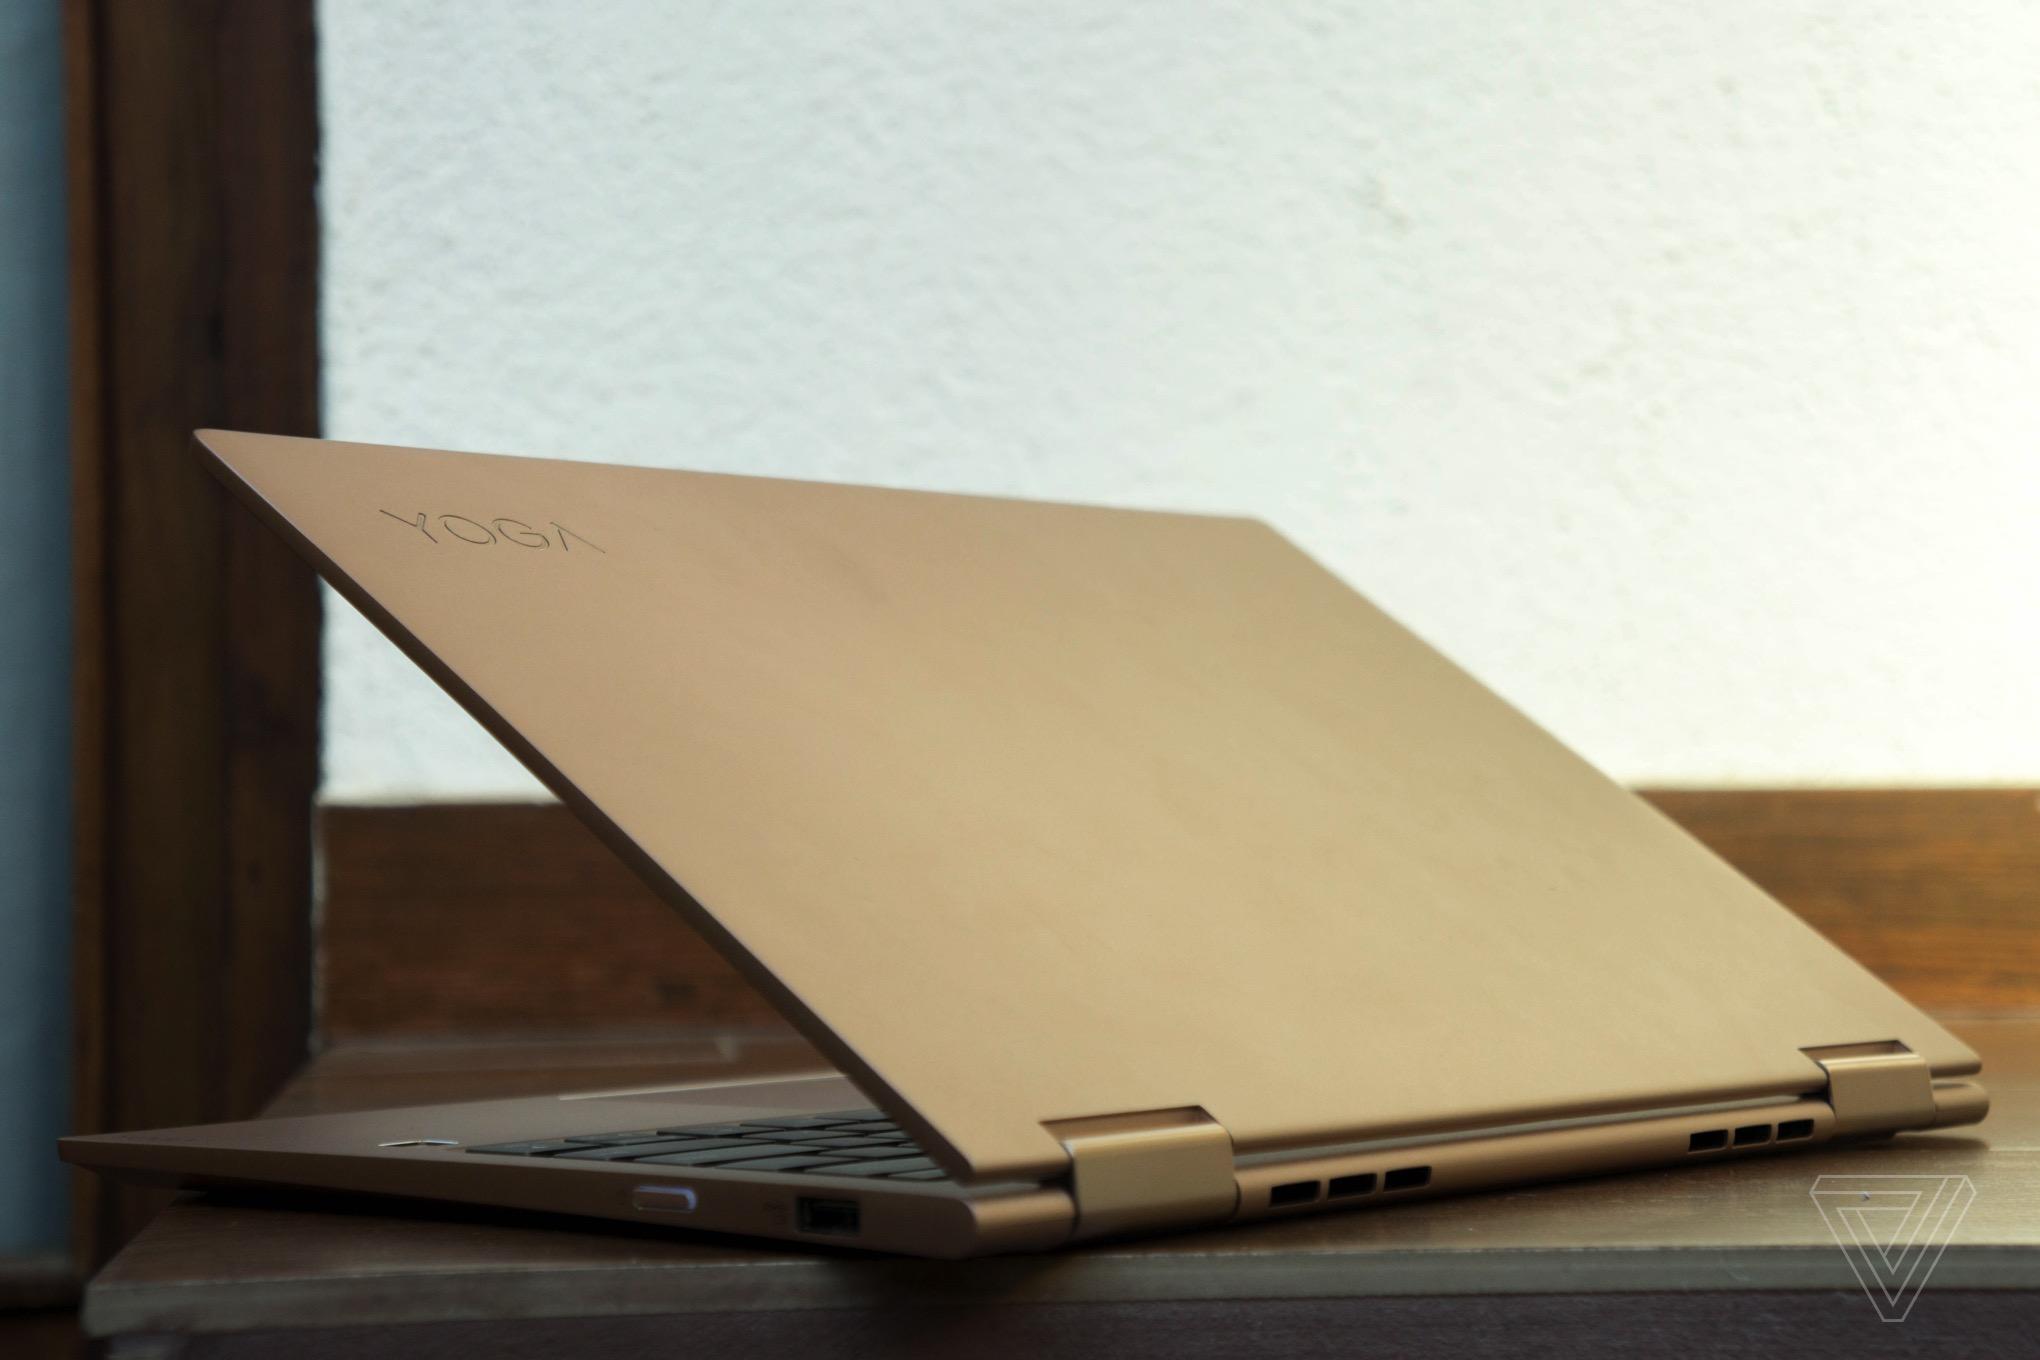 Lenovo's Yoga 730 2-in-1 laptop has Alexa built in - The Verge